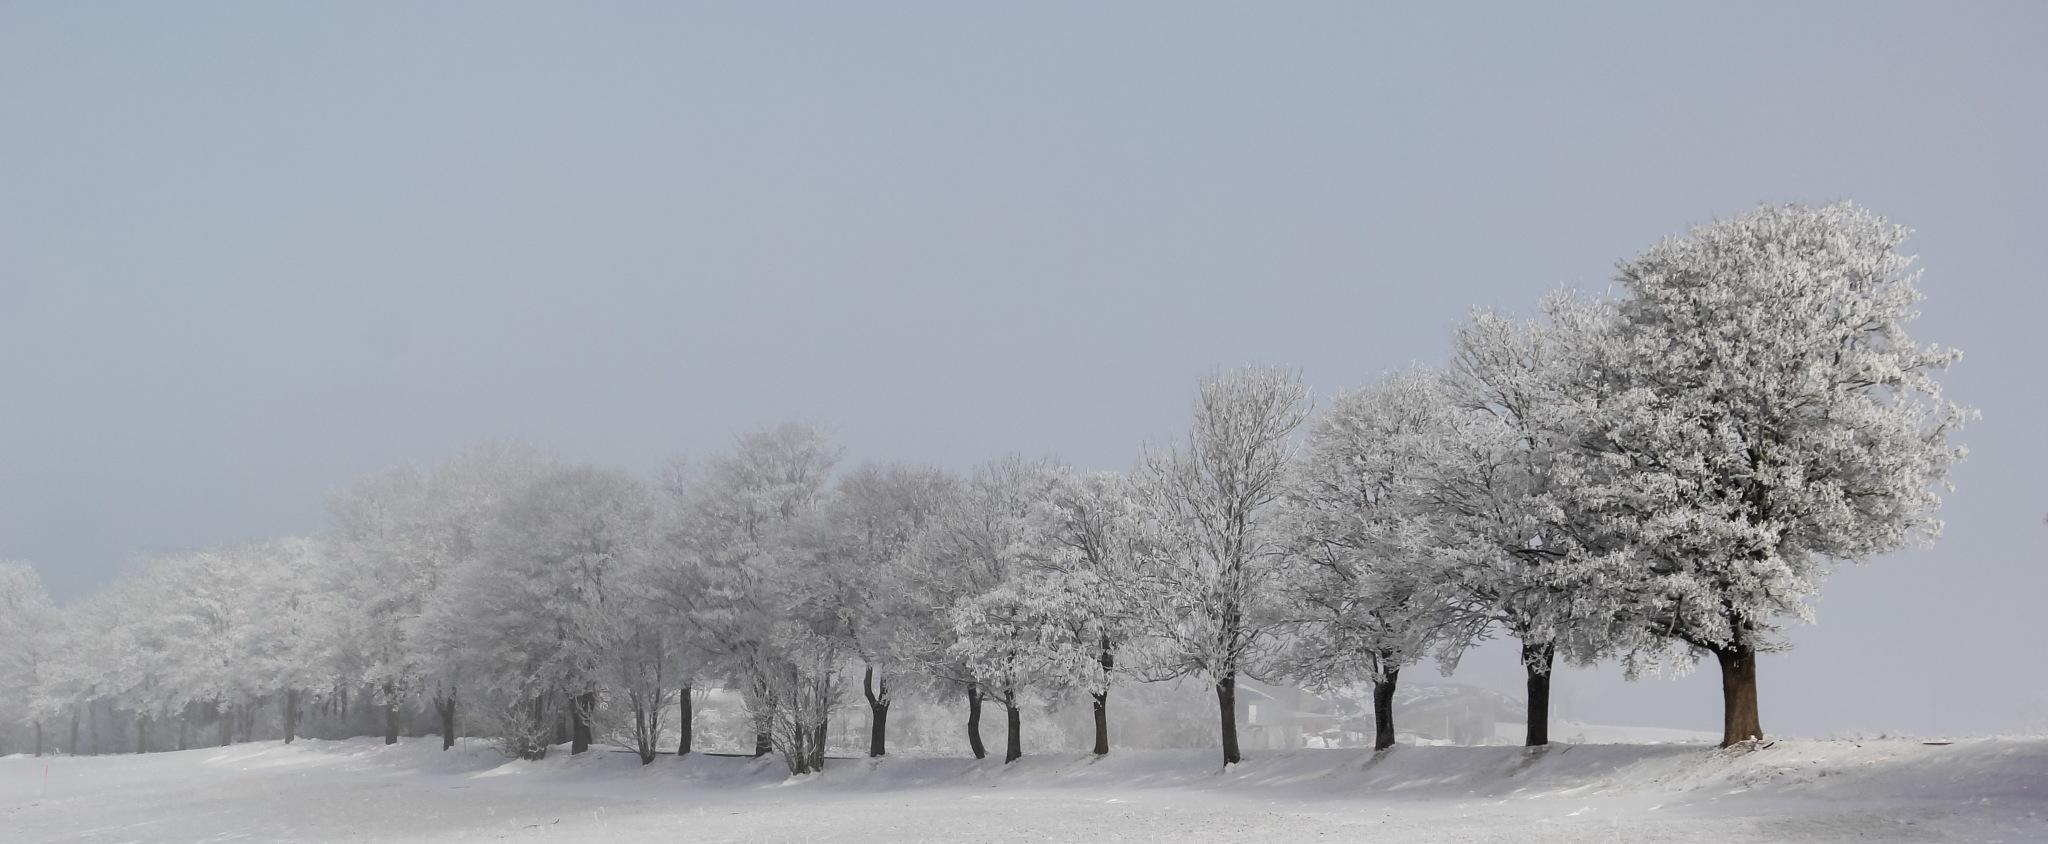 Winterdream  by manuwa